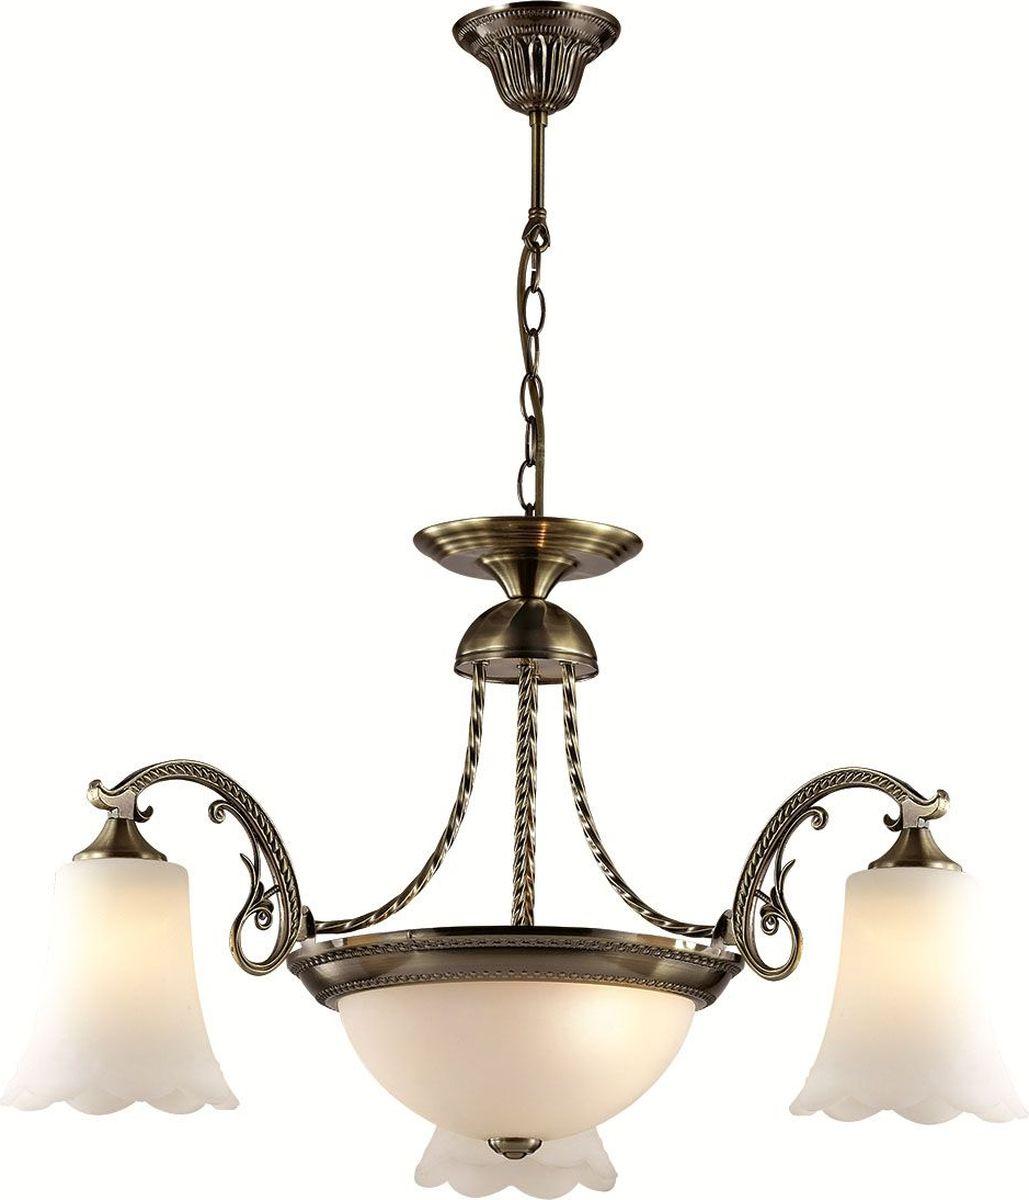 Люстра подвесная Lumion Sonette, цвет: белый, E27, 60 Вт. 2985/5A2985/5A